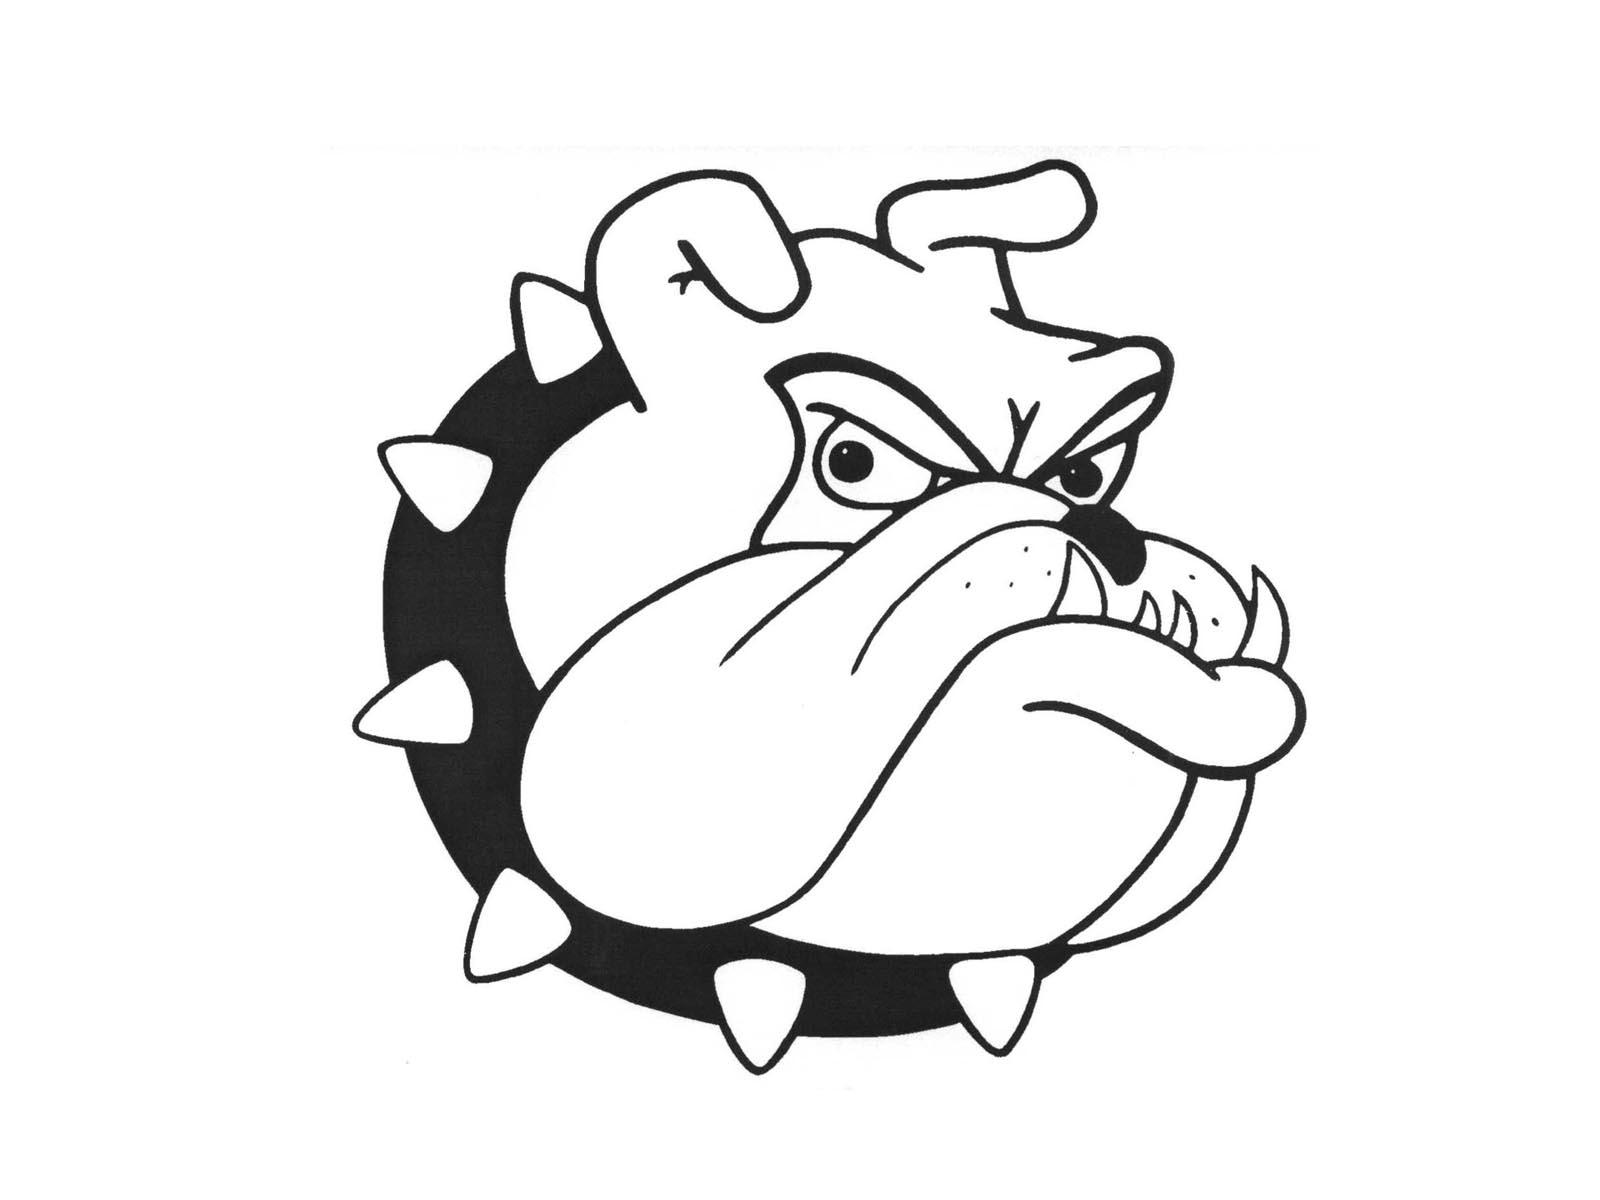 1600x1200 Drawing Of A Bulldog 7. How To Draw A Bulldog Puppy, Bulldog Puppy